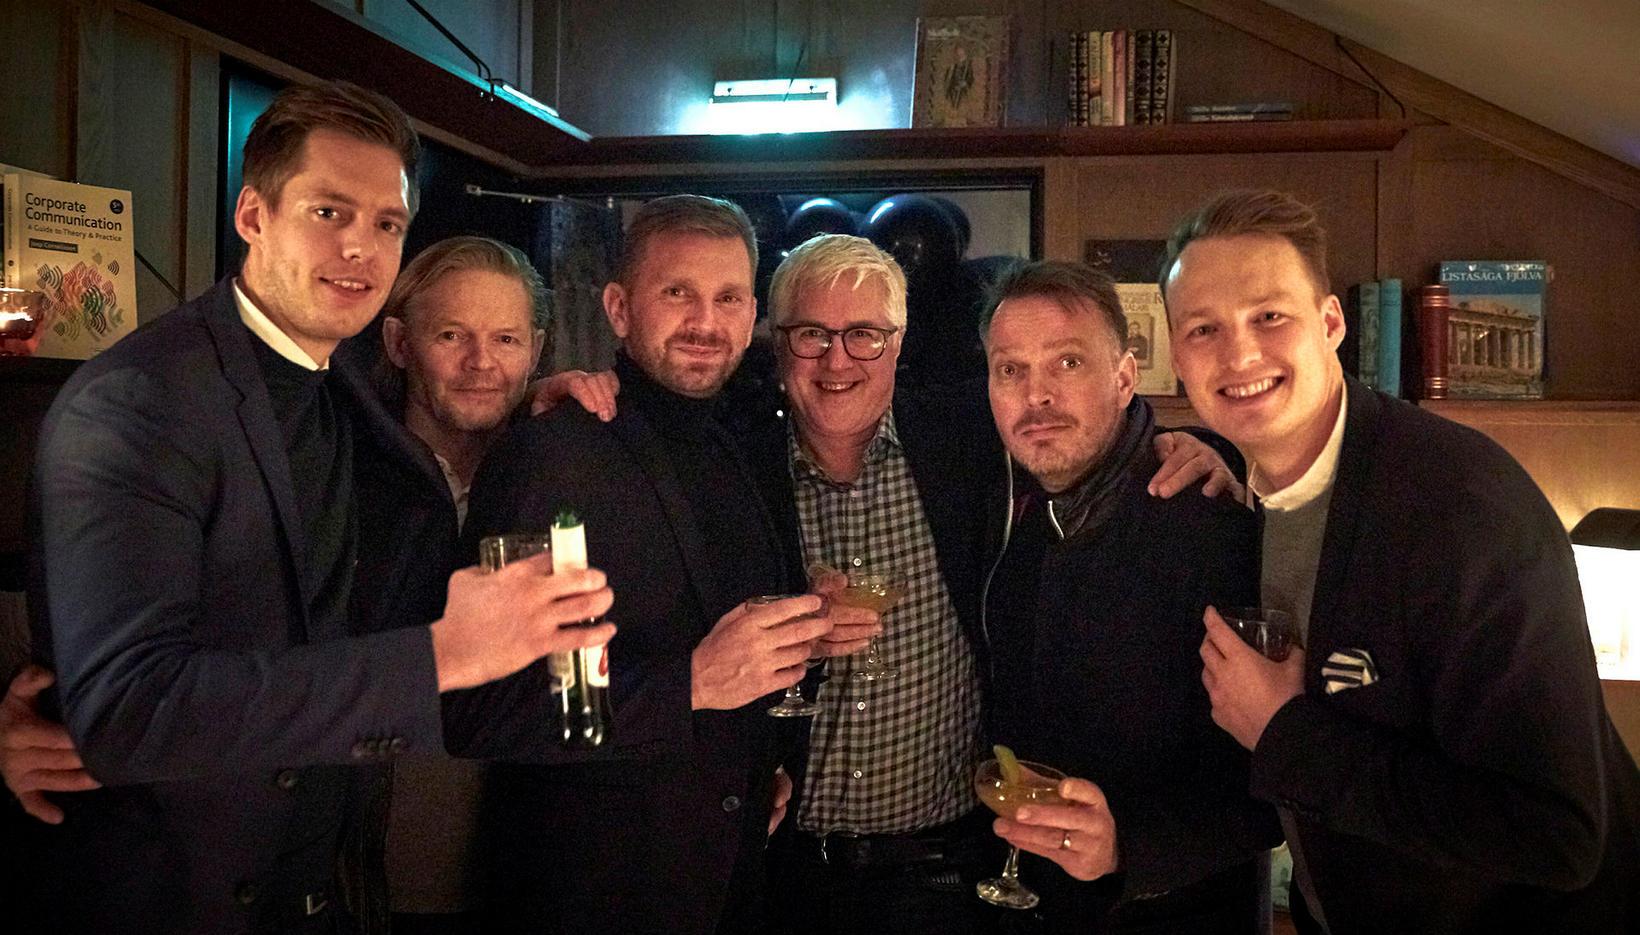 Benedikt Karlsson, Björn Ingi Hilmarsson, Hjalti Harðarson, Jón Benediktsson, Vilhjálmur …